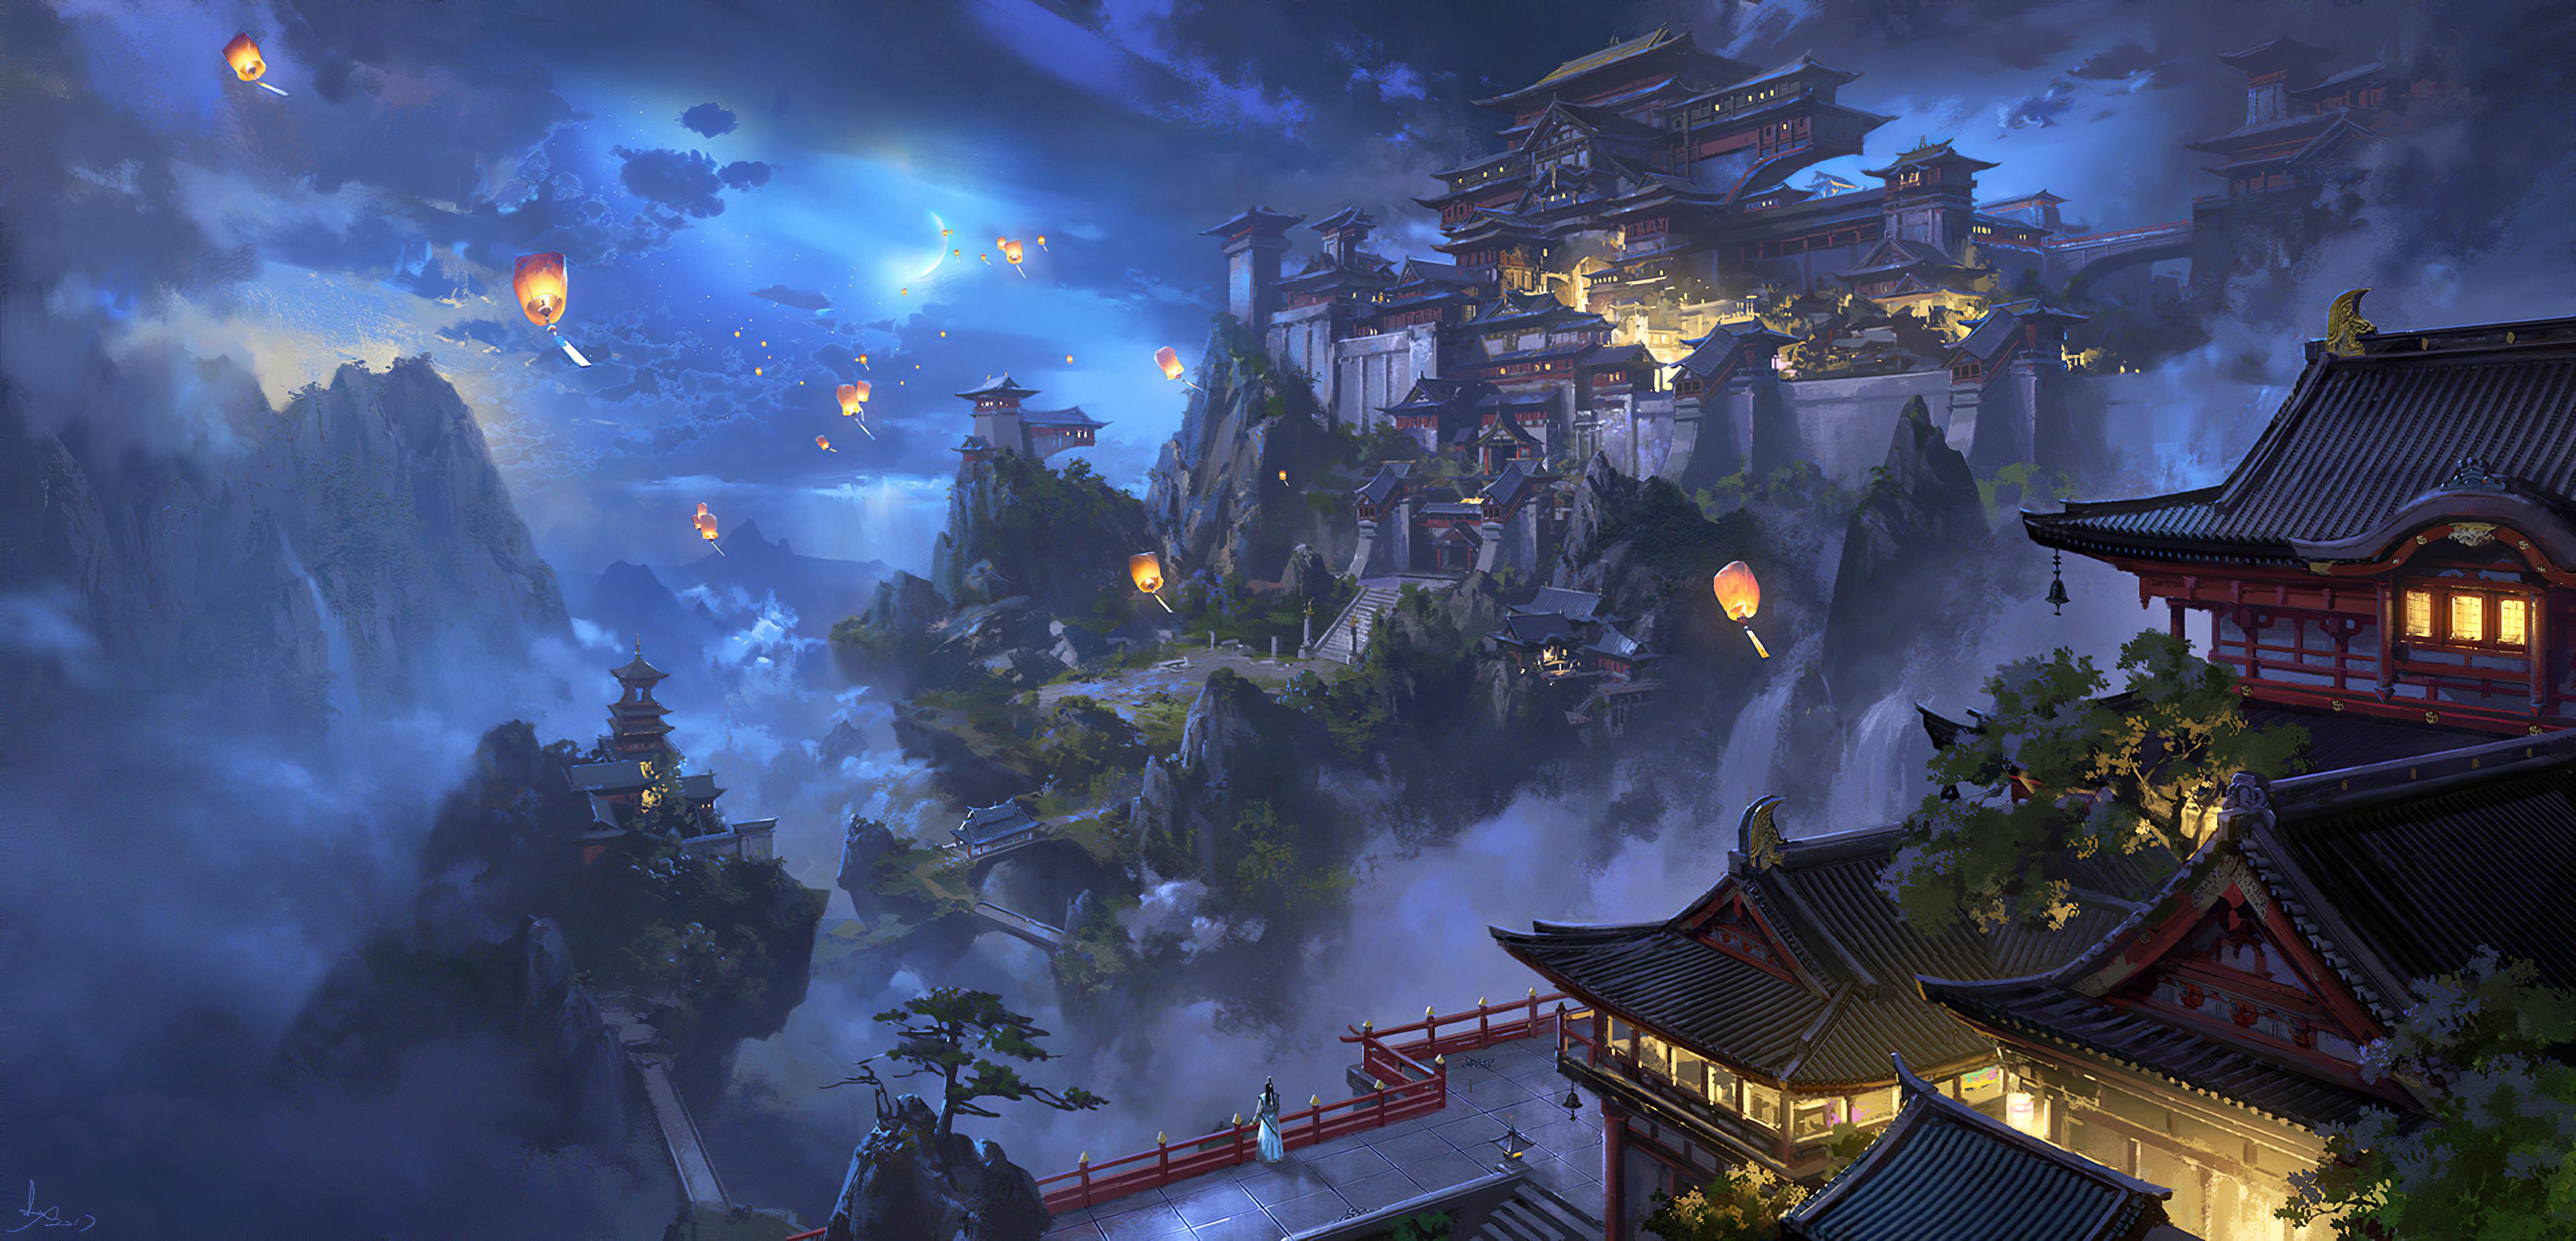 kongming latern 1574941106 - Kongming Latern -